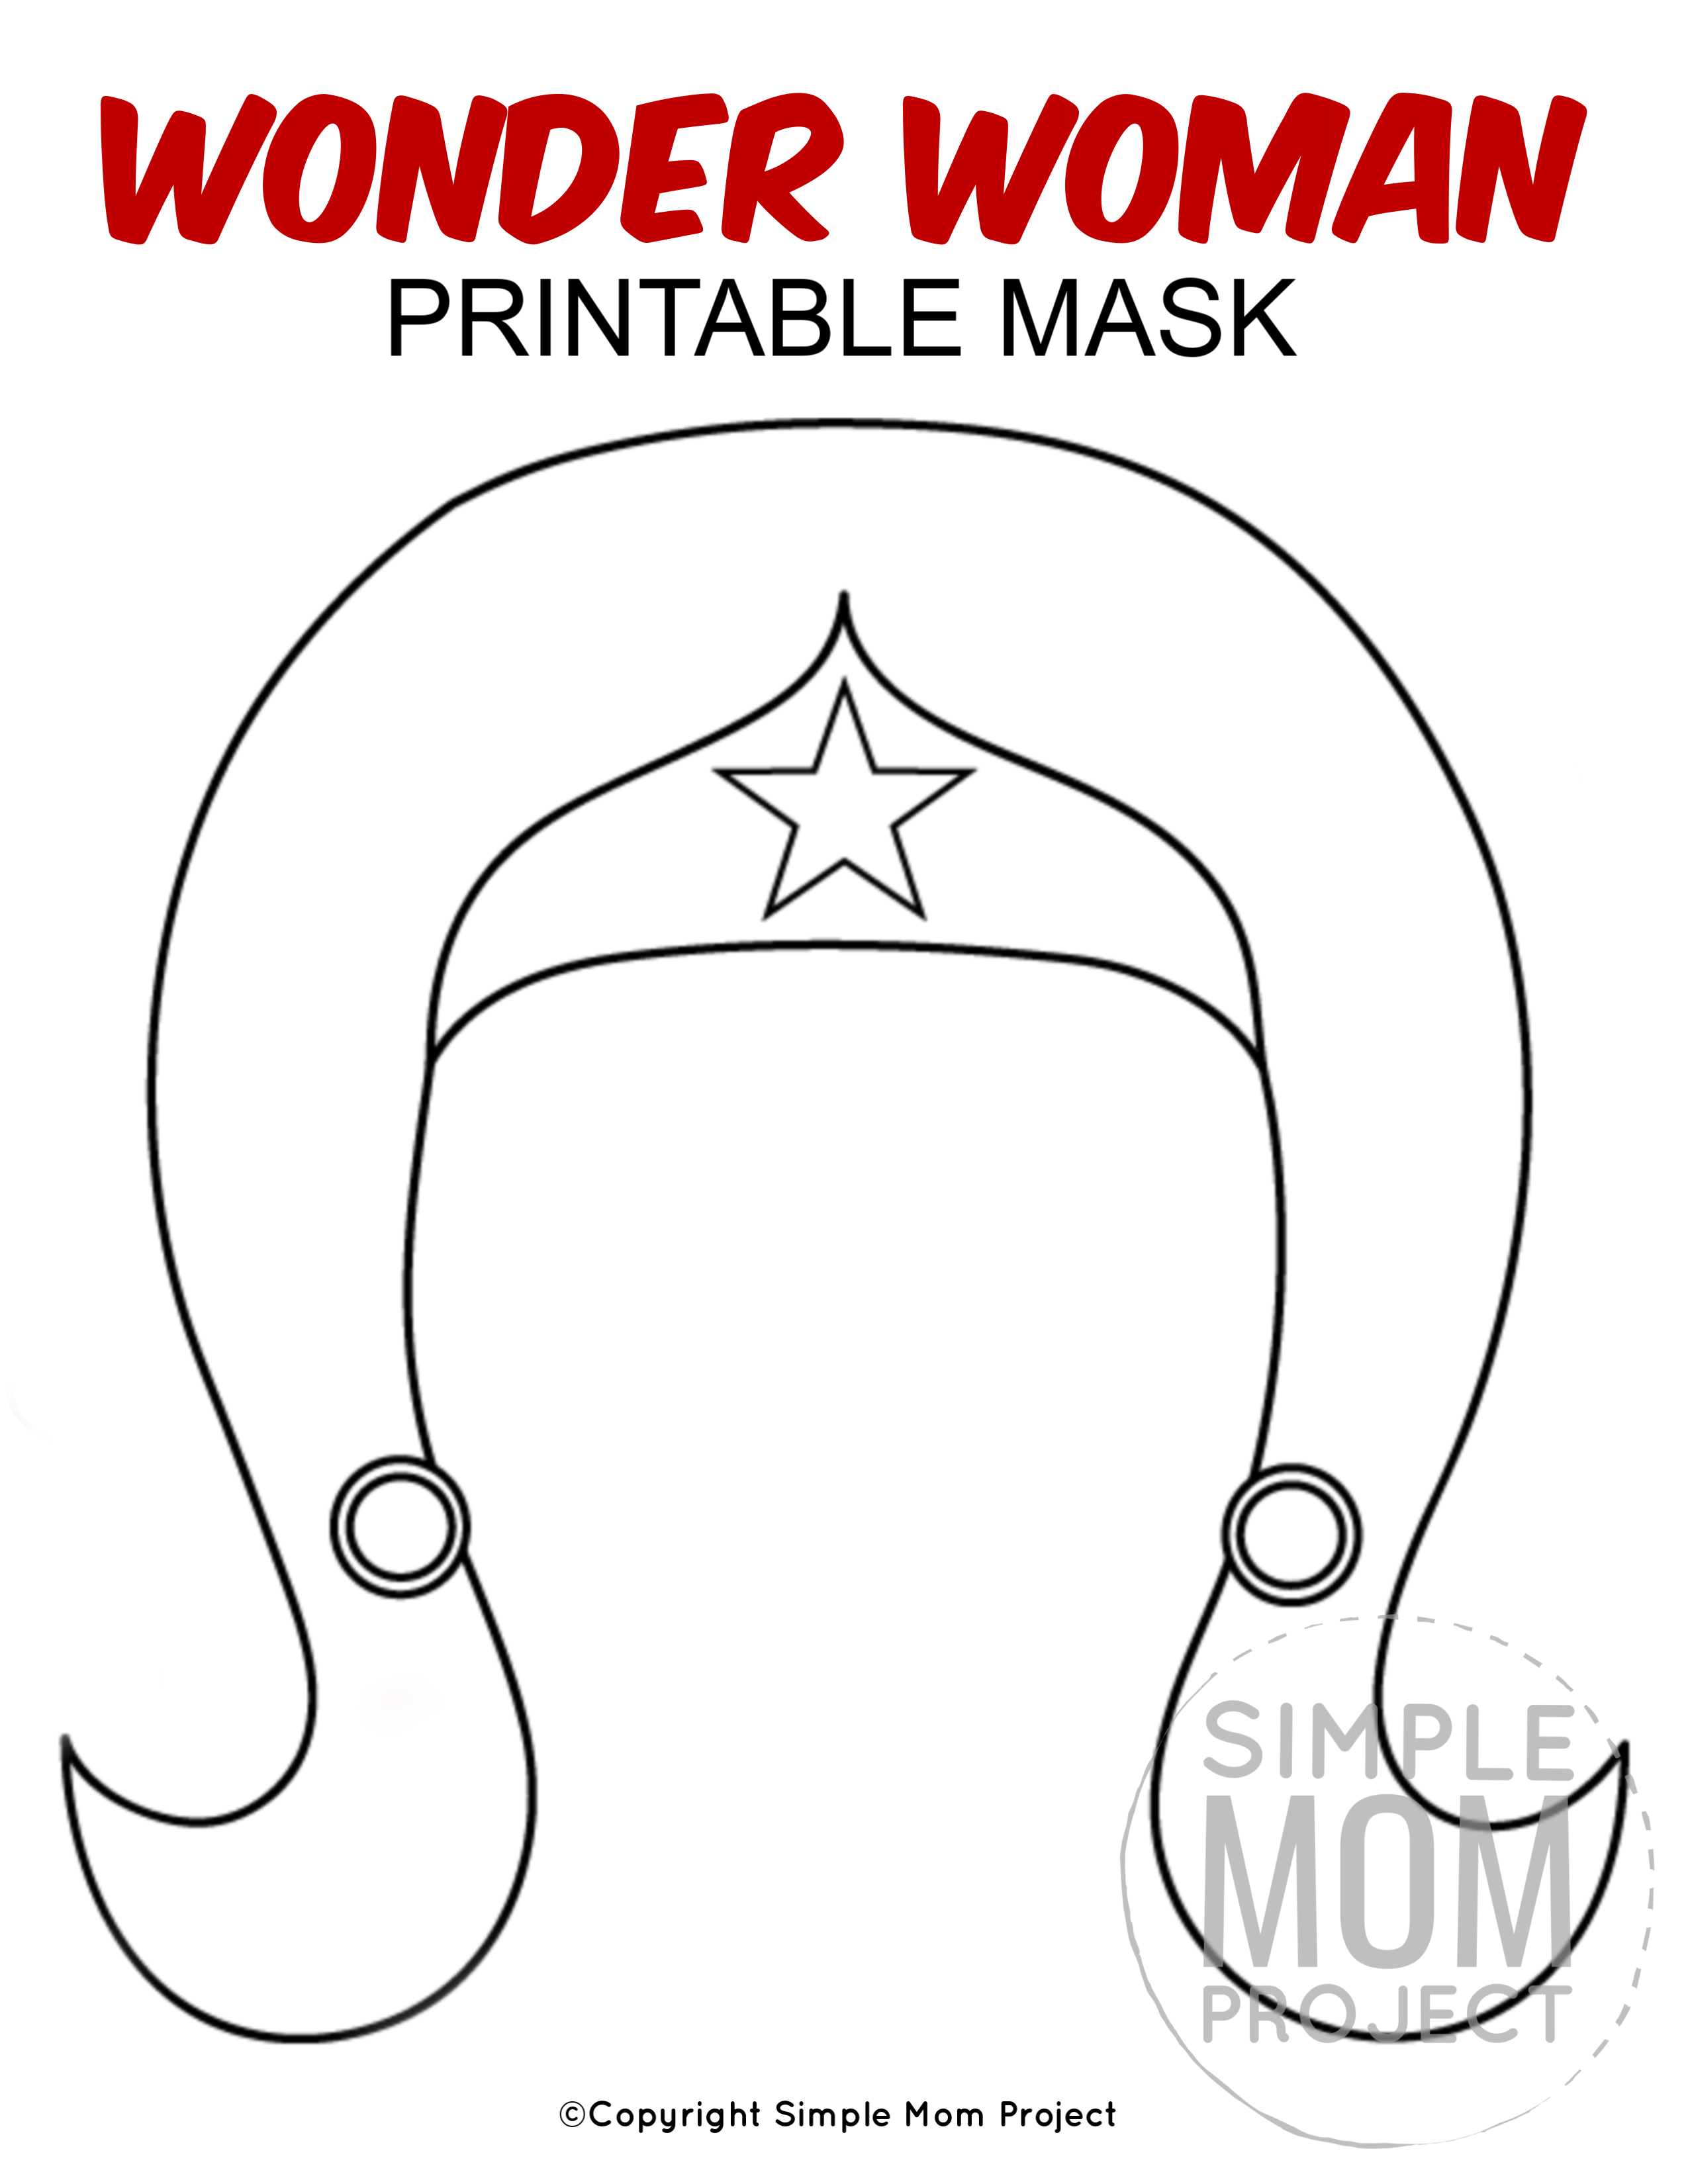 Free Printable Wonder Woman Mask Template In 2020 Mask For Kids Face Masks For Kids Wonder Woman Mask